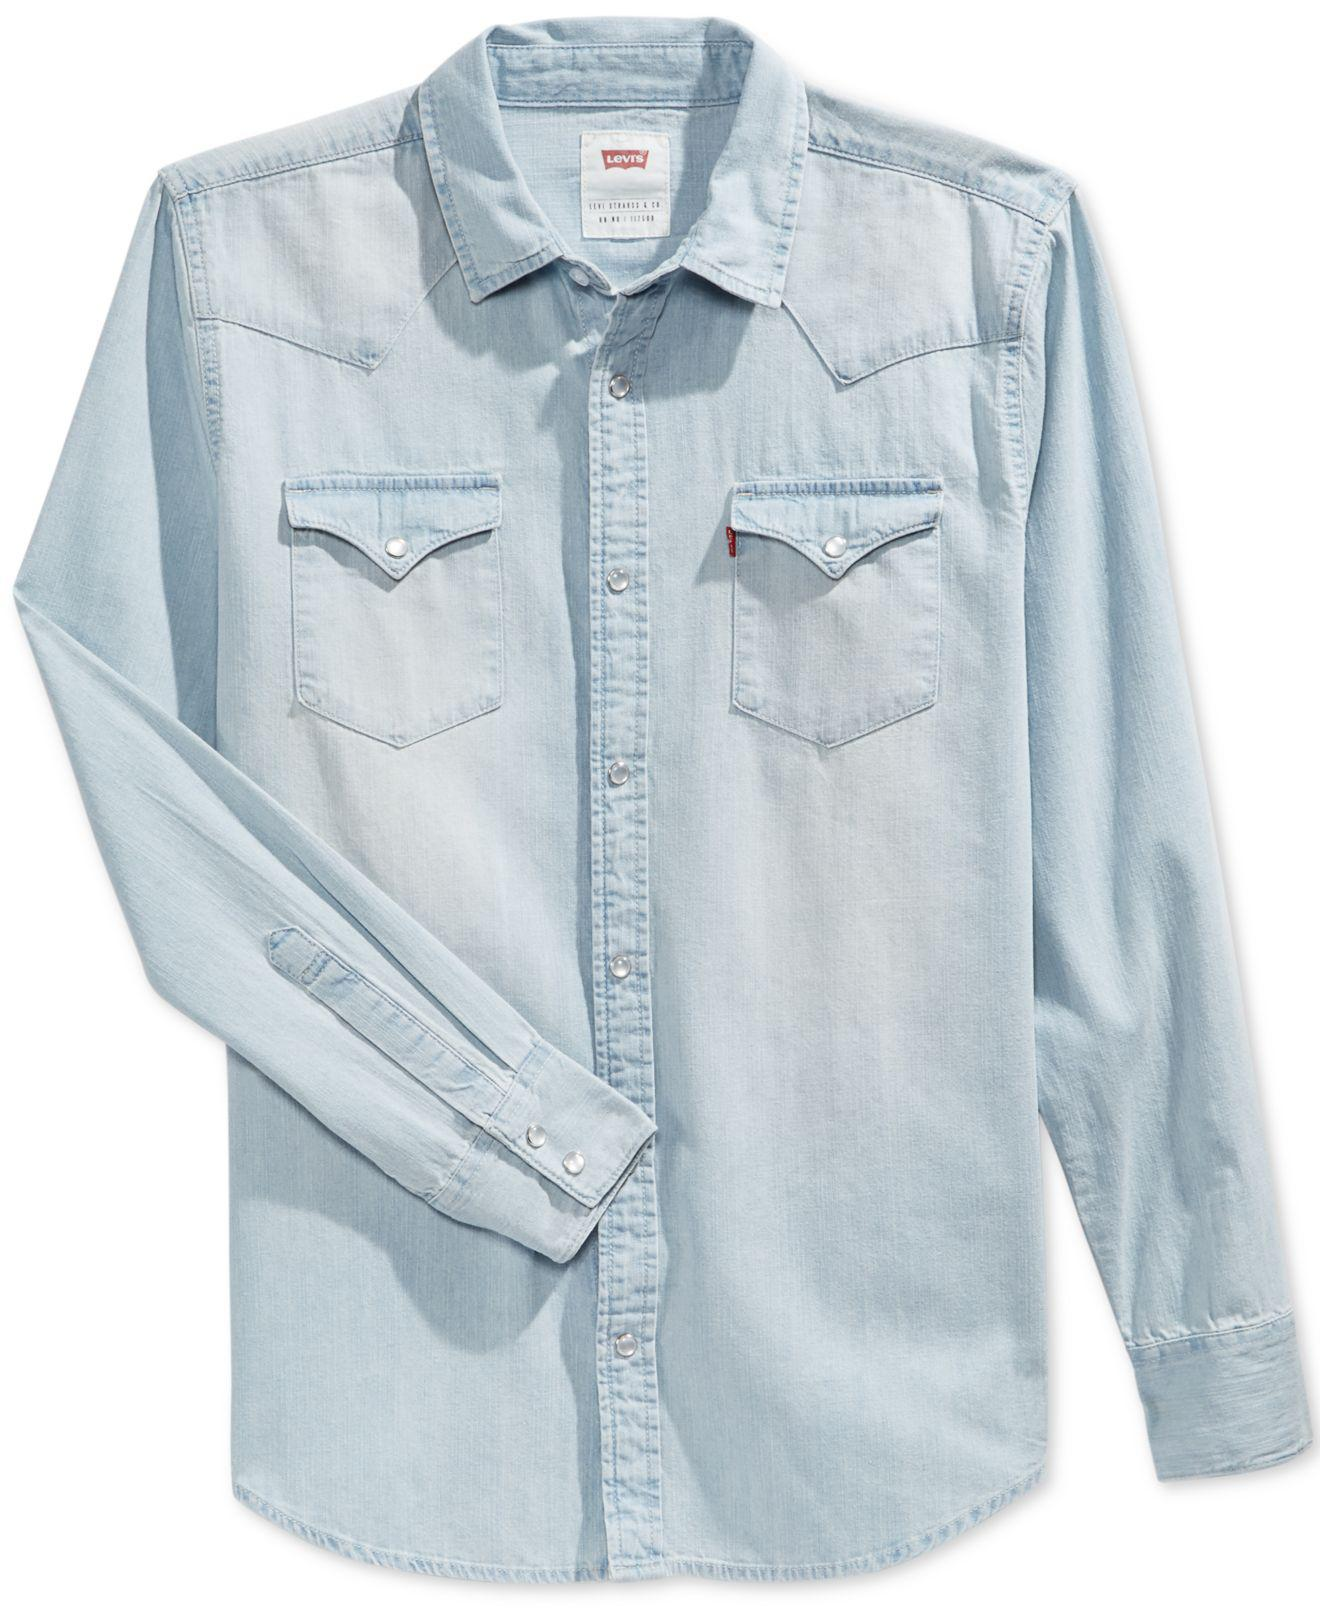 8e1529cb Levi's Standard Barstow Western Long-sleeve Denim Shirt in Blue for ...